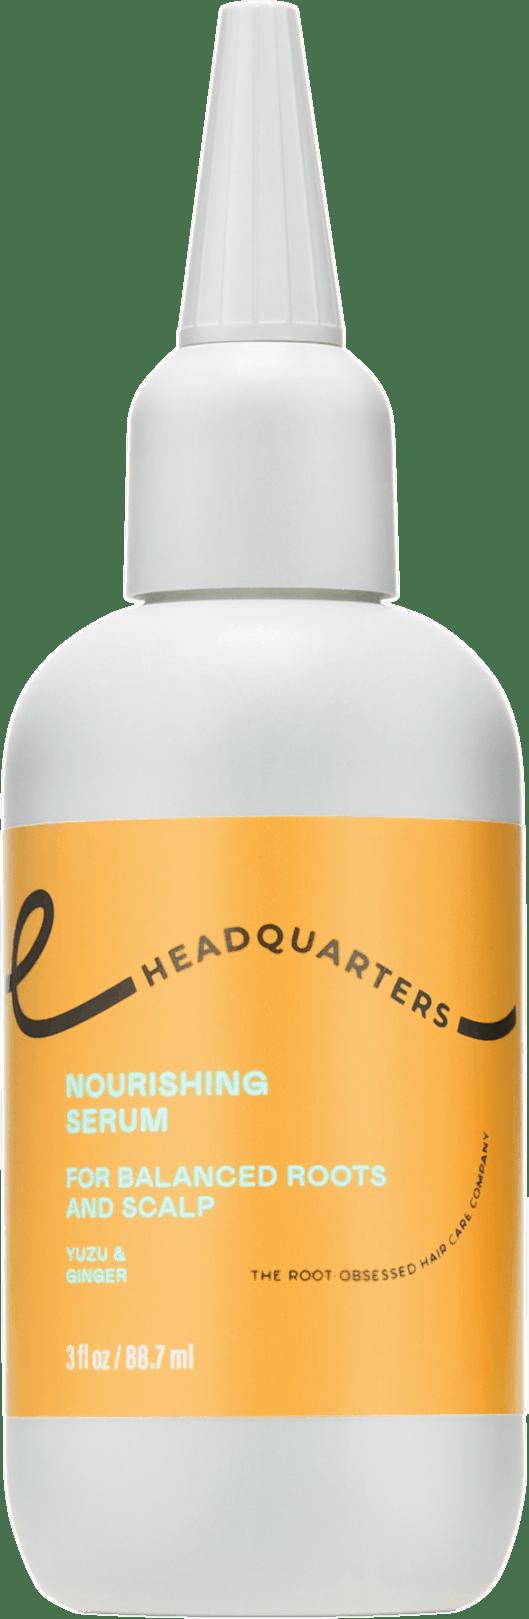 Headquarters Nourishing Serum Balanced scalp care bottle